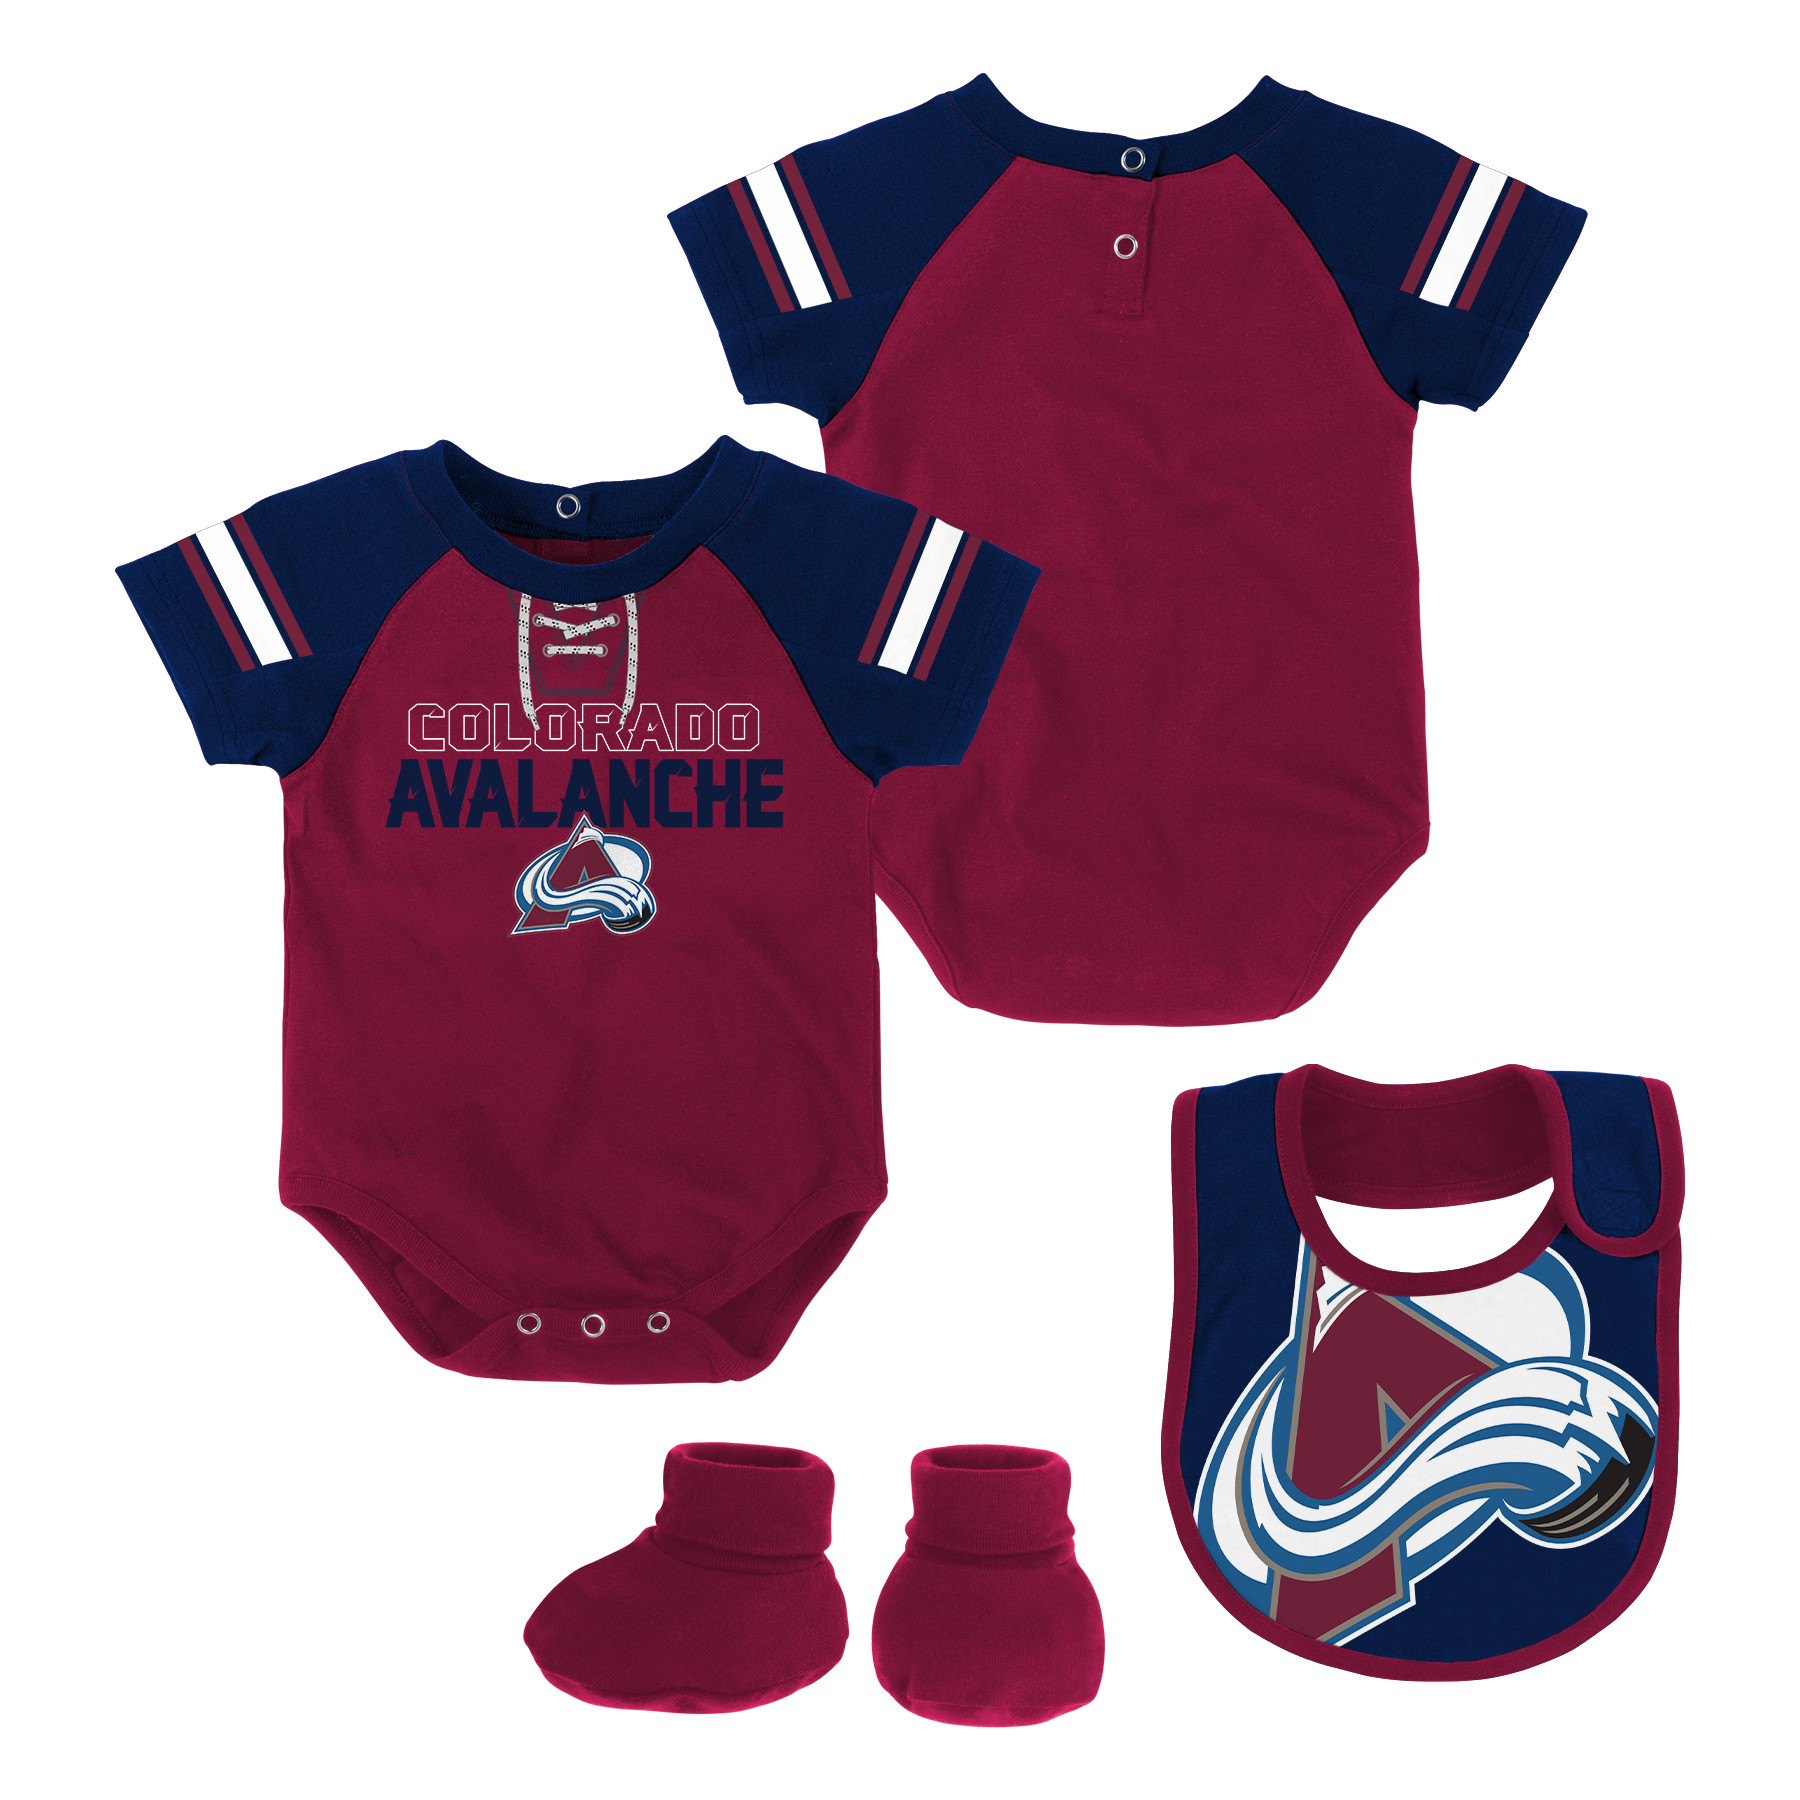 Newborn & Infant Burgundy Colorado Avalanche Little D-Man Bodysuit, Bib & Booties Set by Outerstuff